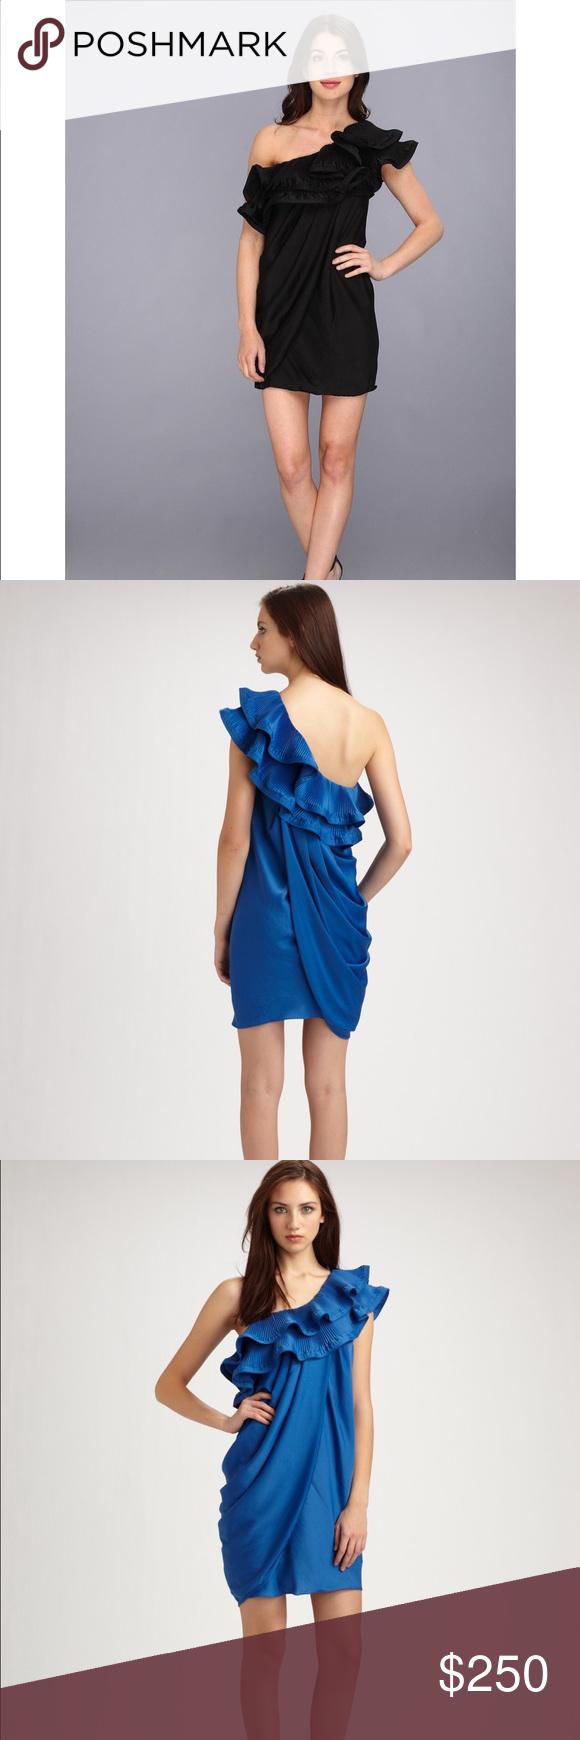 BCBG MaxAzria Ruffle One-Shoulder Draped Dress Worn once perfect condition!! BCBGMaxAzria Dresses Mini